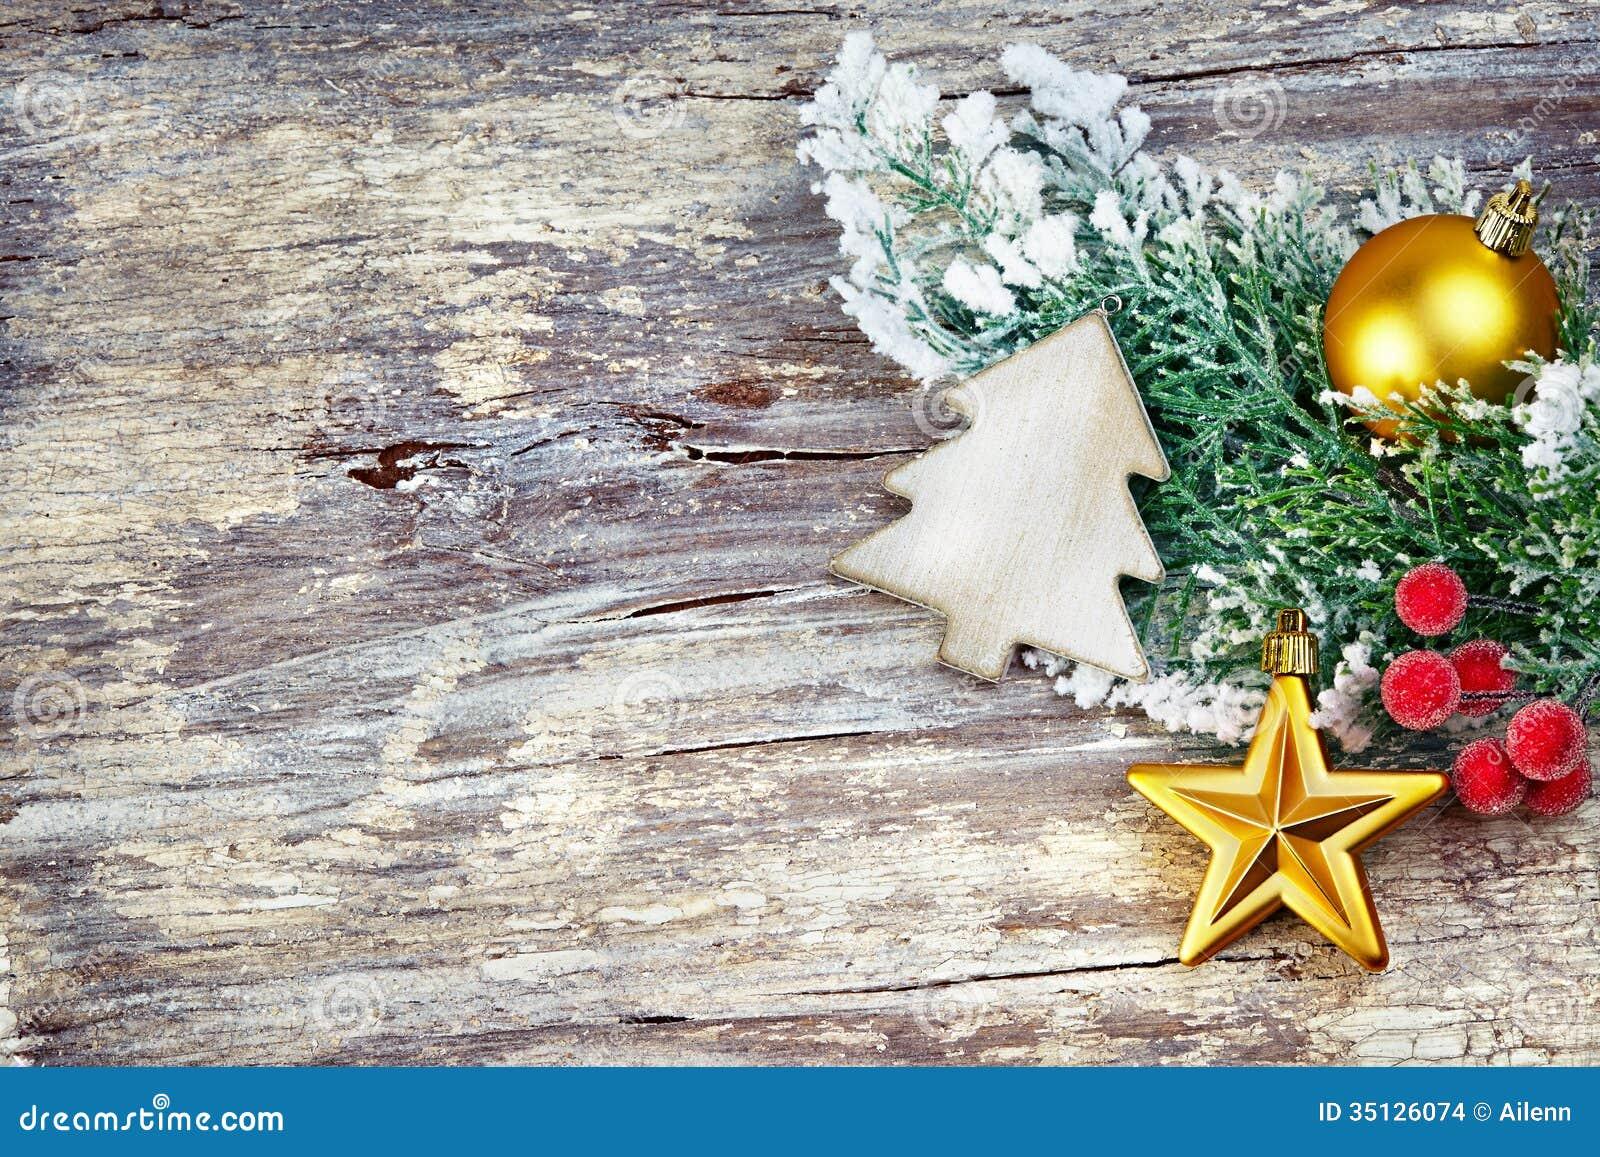 christmas decoration over wooden background vintage style stock photo. Black Bedroom Furniture Sets. Home Design Ideas